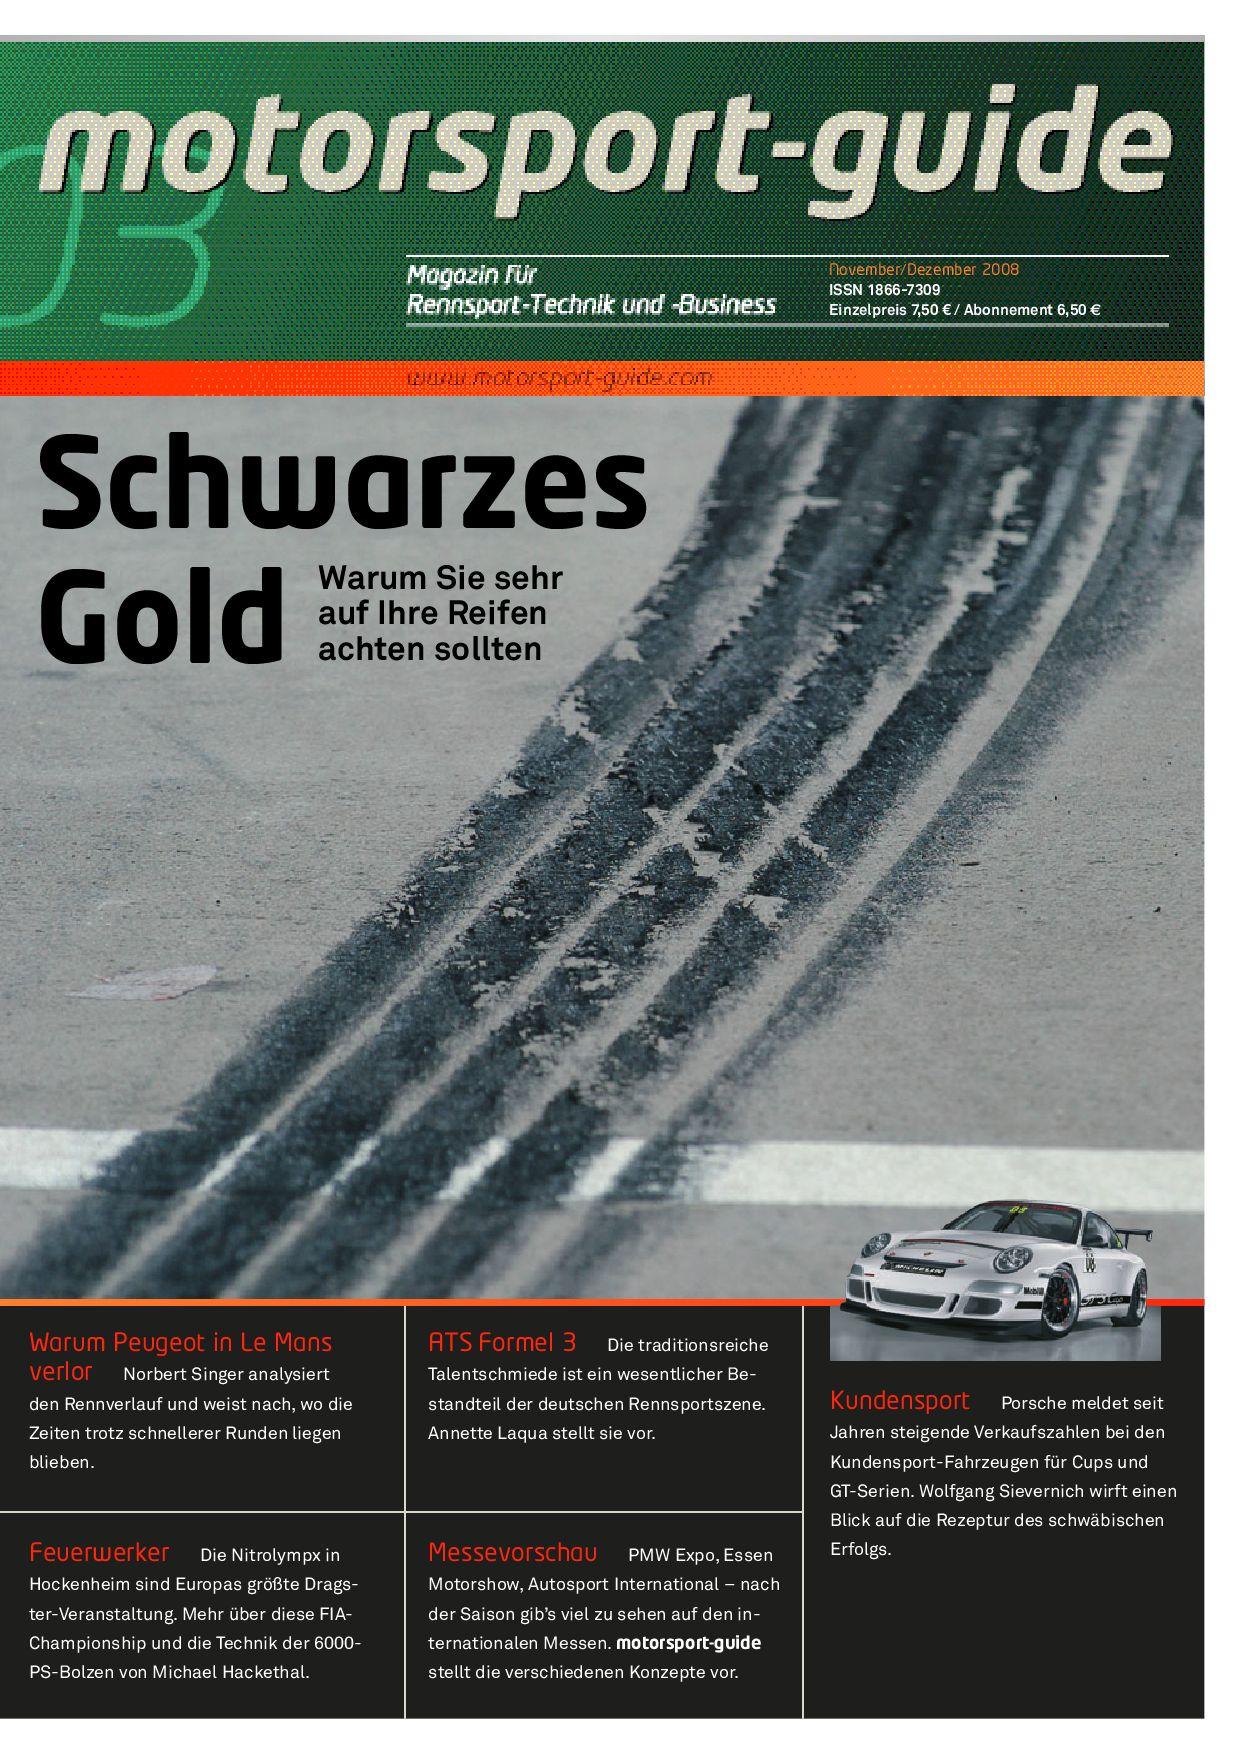 motorsport-guide 03-2008 by motorsport-guide - issuu